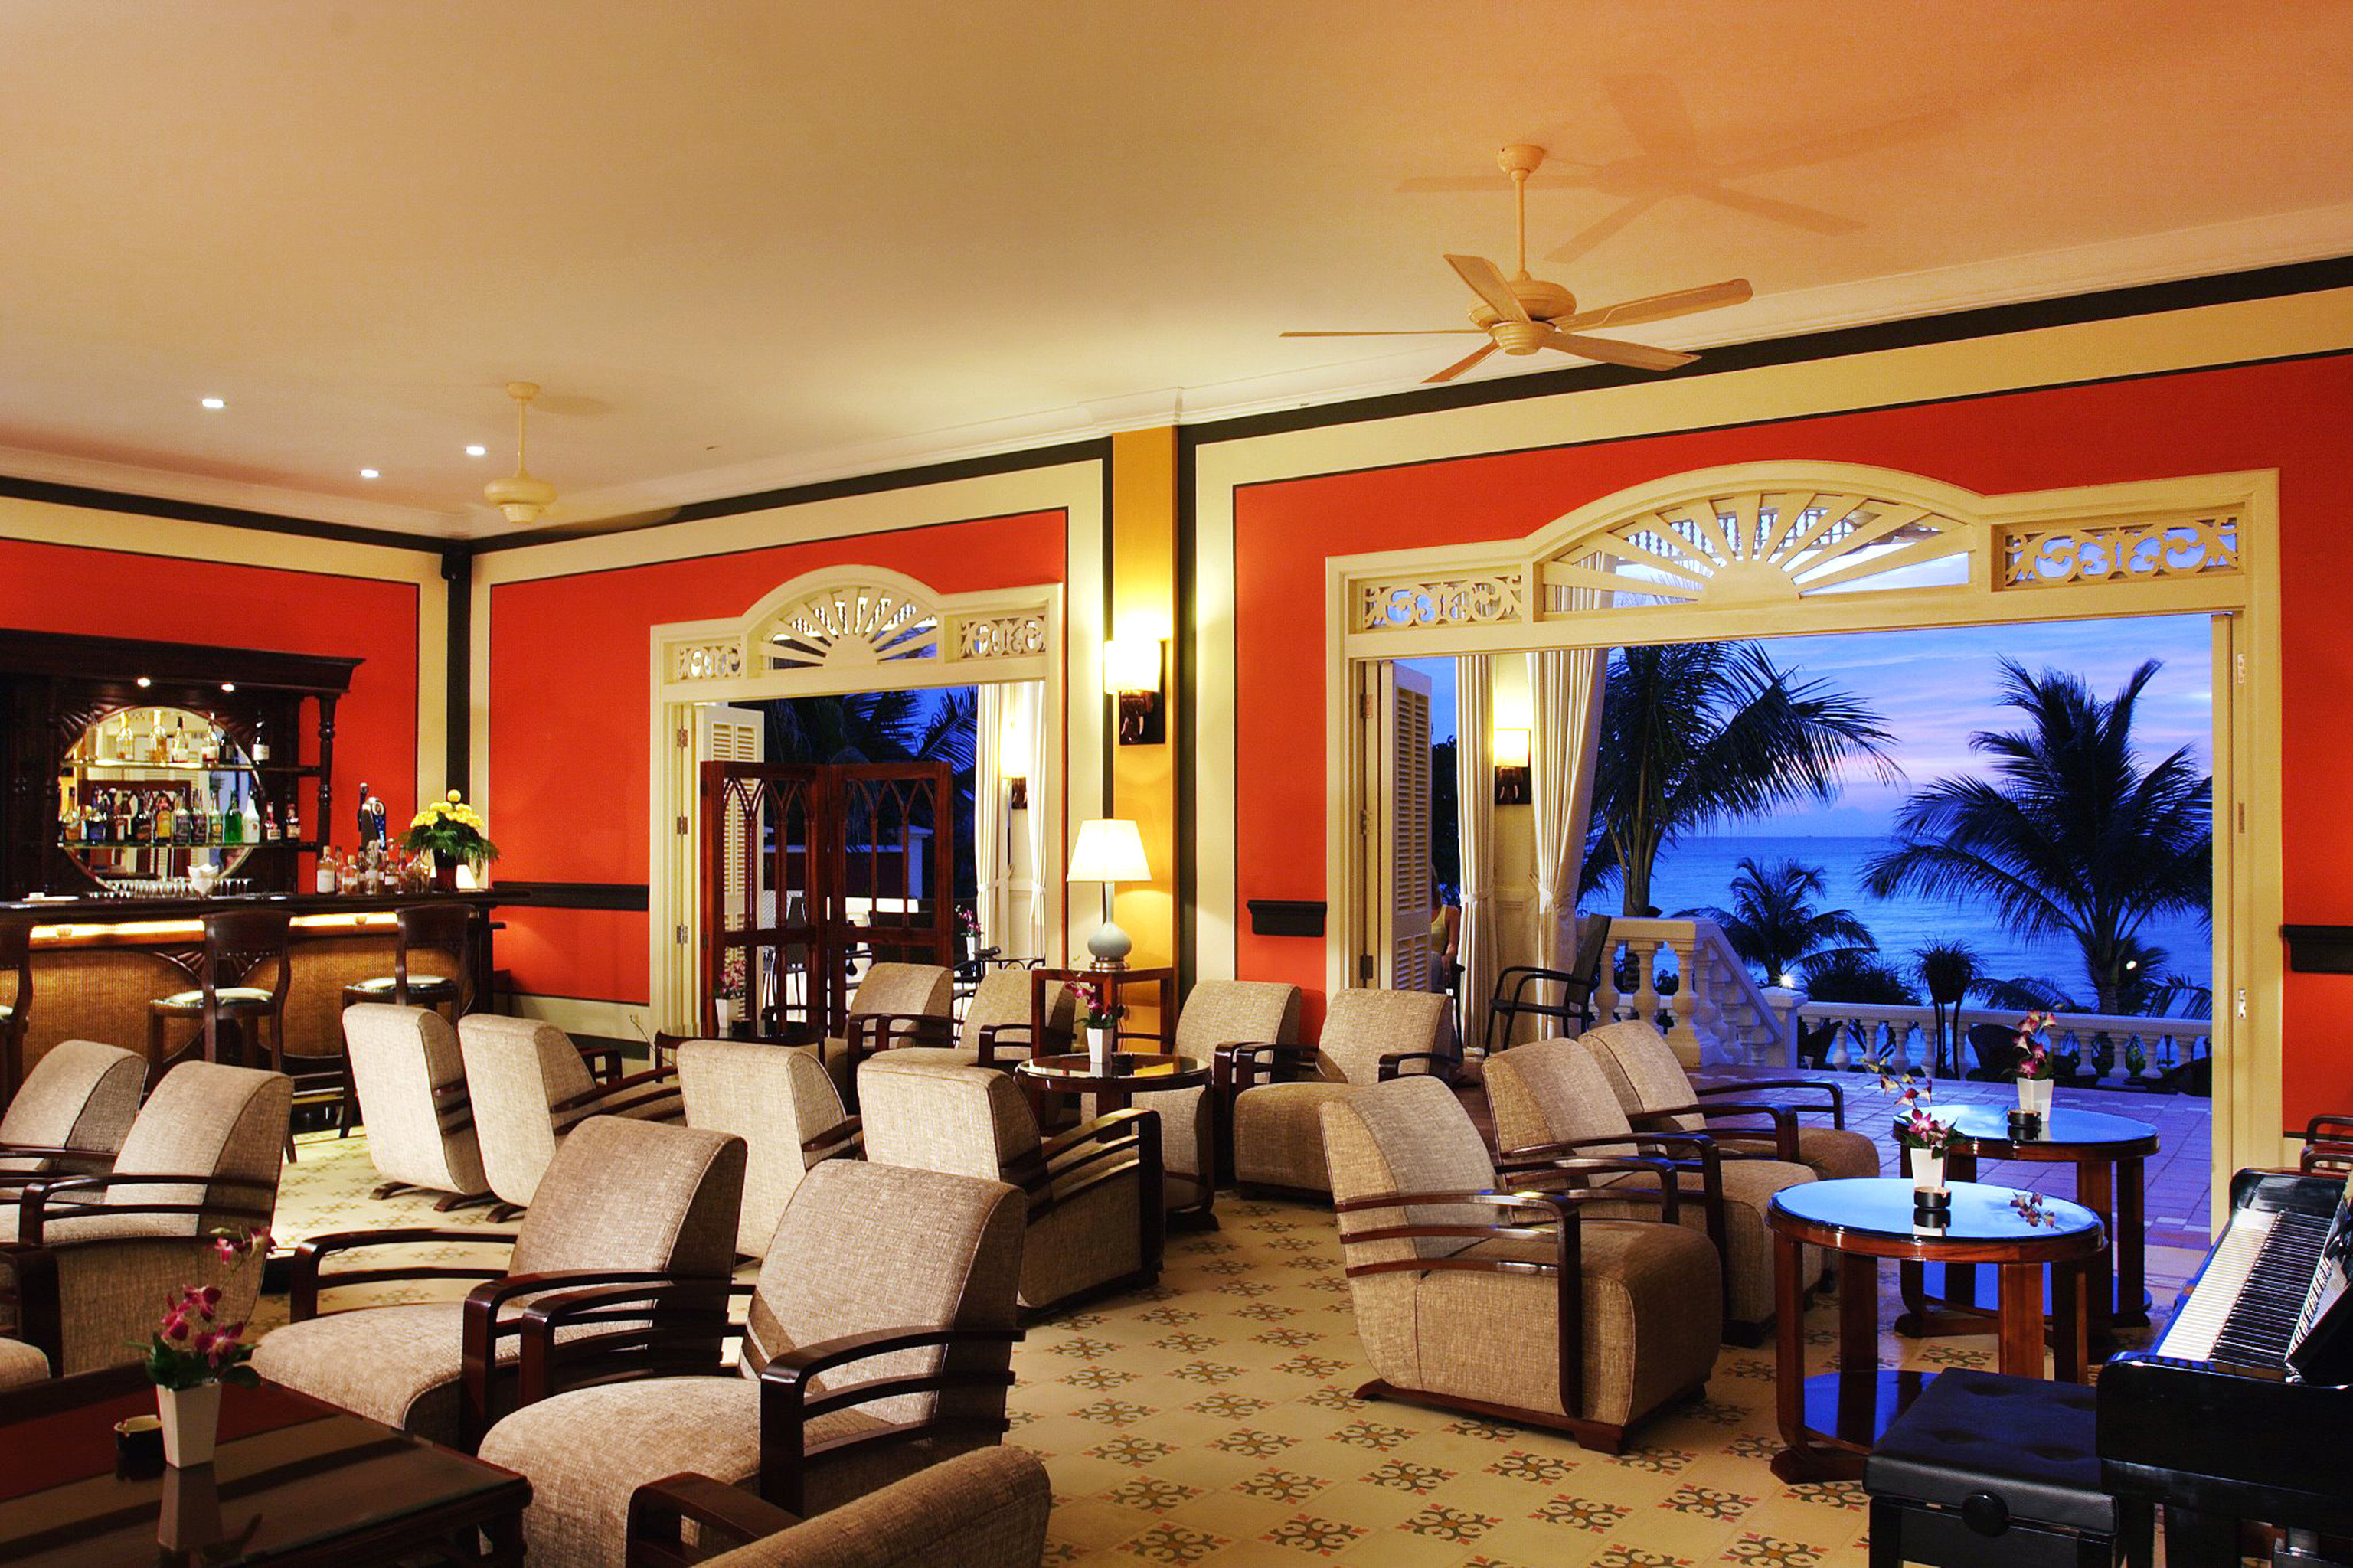 Beachfront Dining Drink Eat Island Resort Waterfront property restaurant Lobby recreation room living room Suite Bar